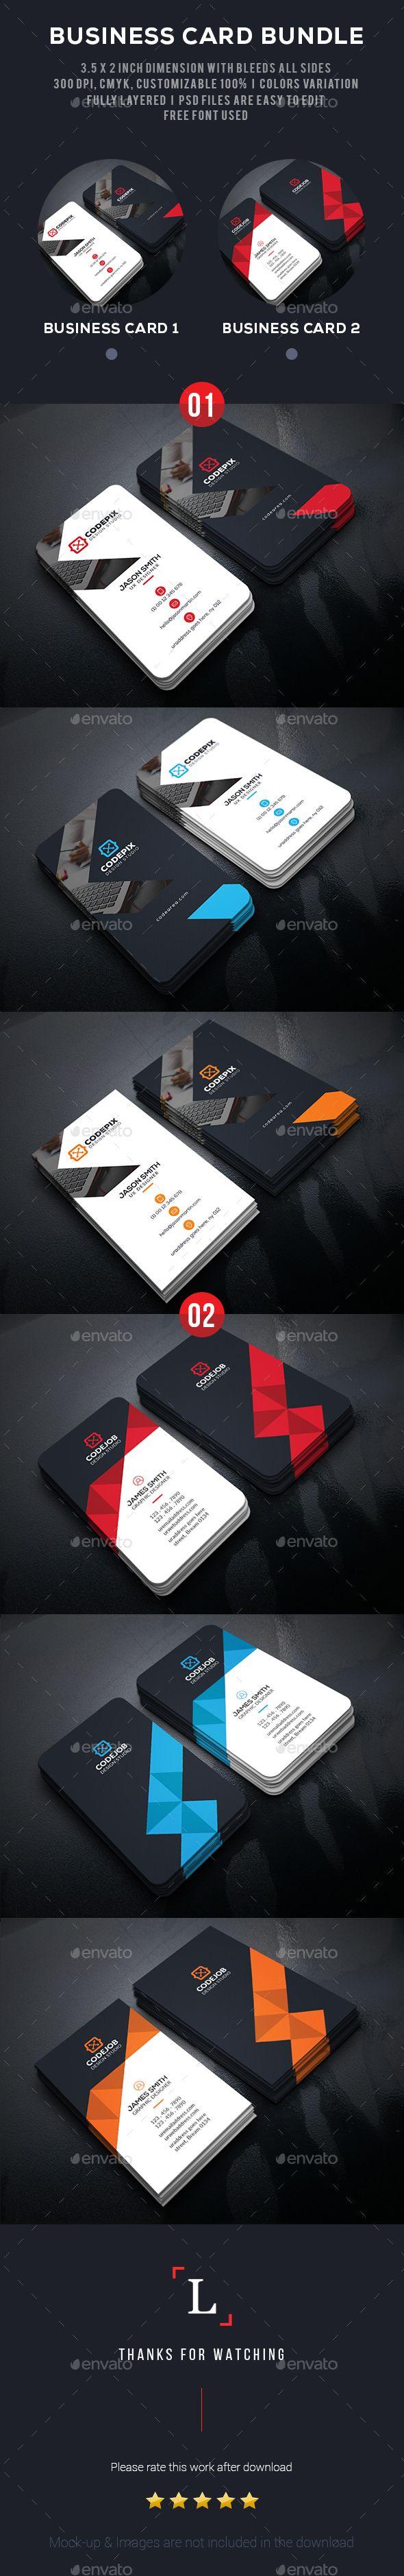 Business Card Template PSD Bundle. Download here: http://graphicriver.net/item/business-card-bundle/15592808?ref=ksioks